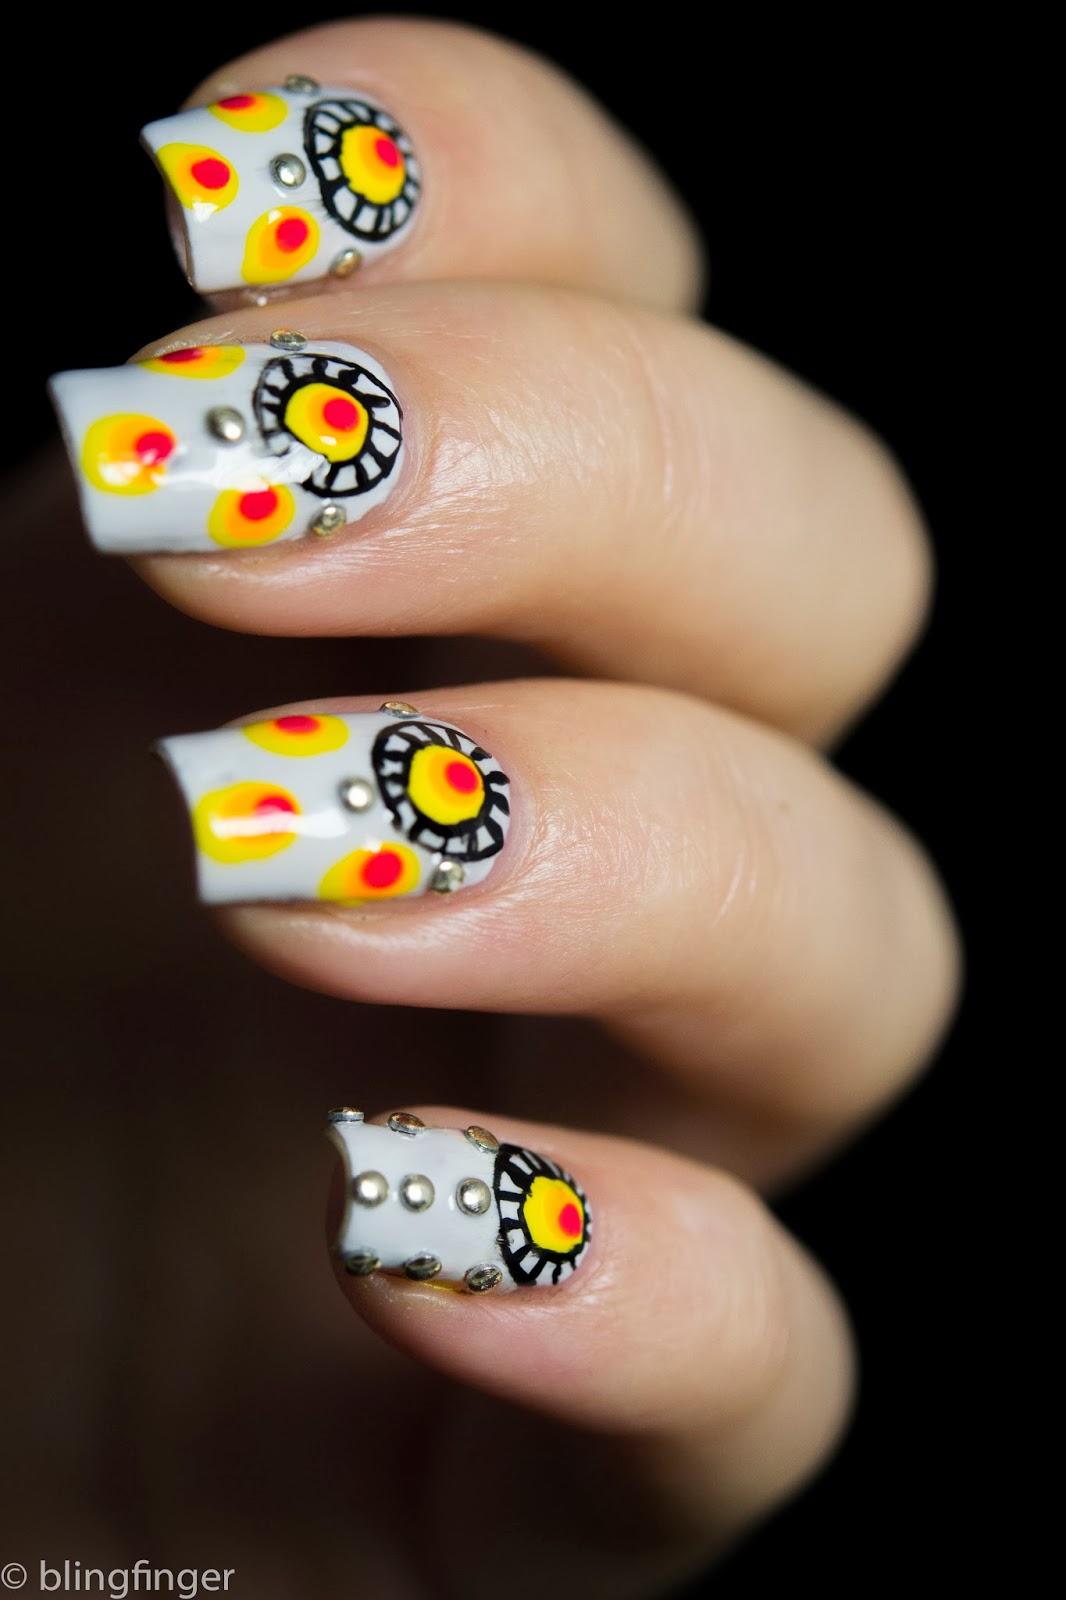 Weird Nail Art | unusual nail art ideas qikkwit your ...